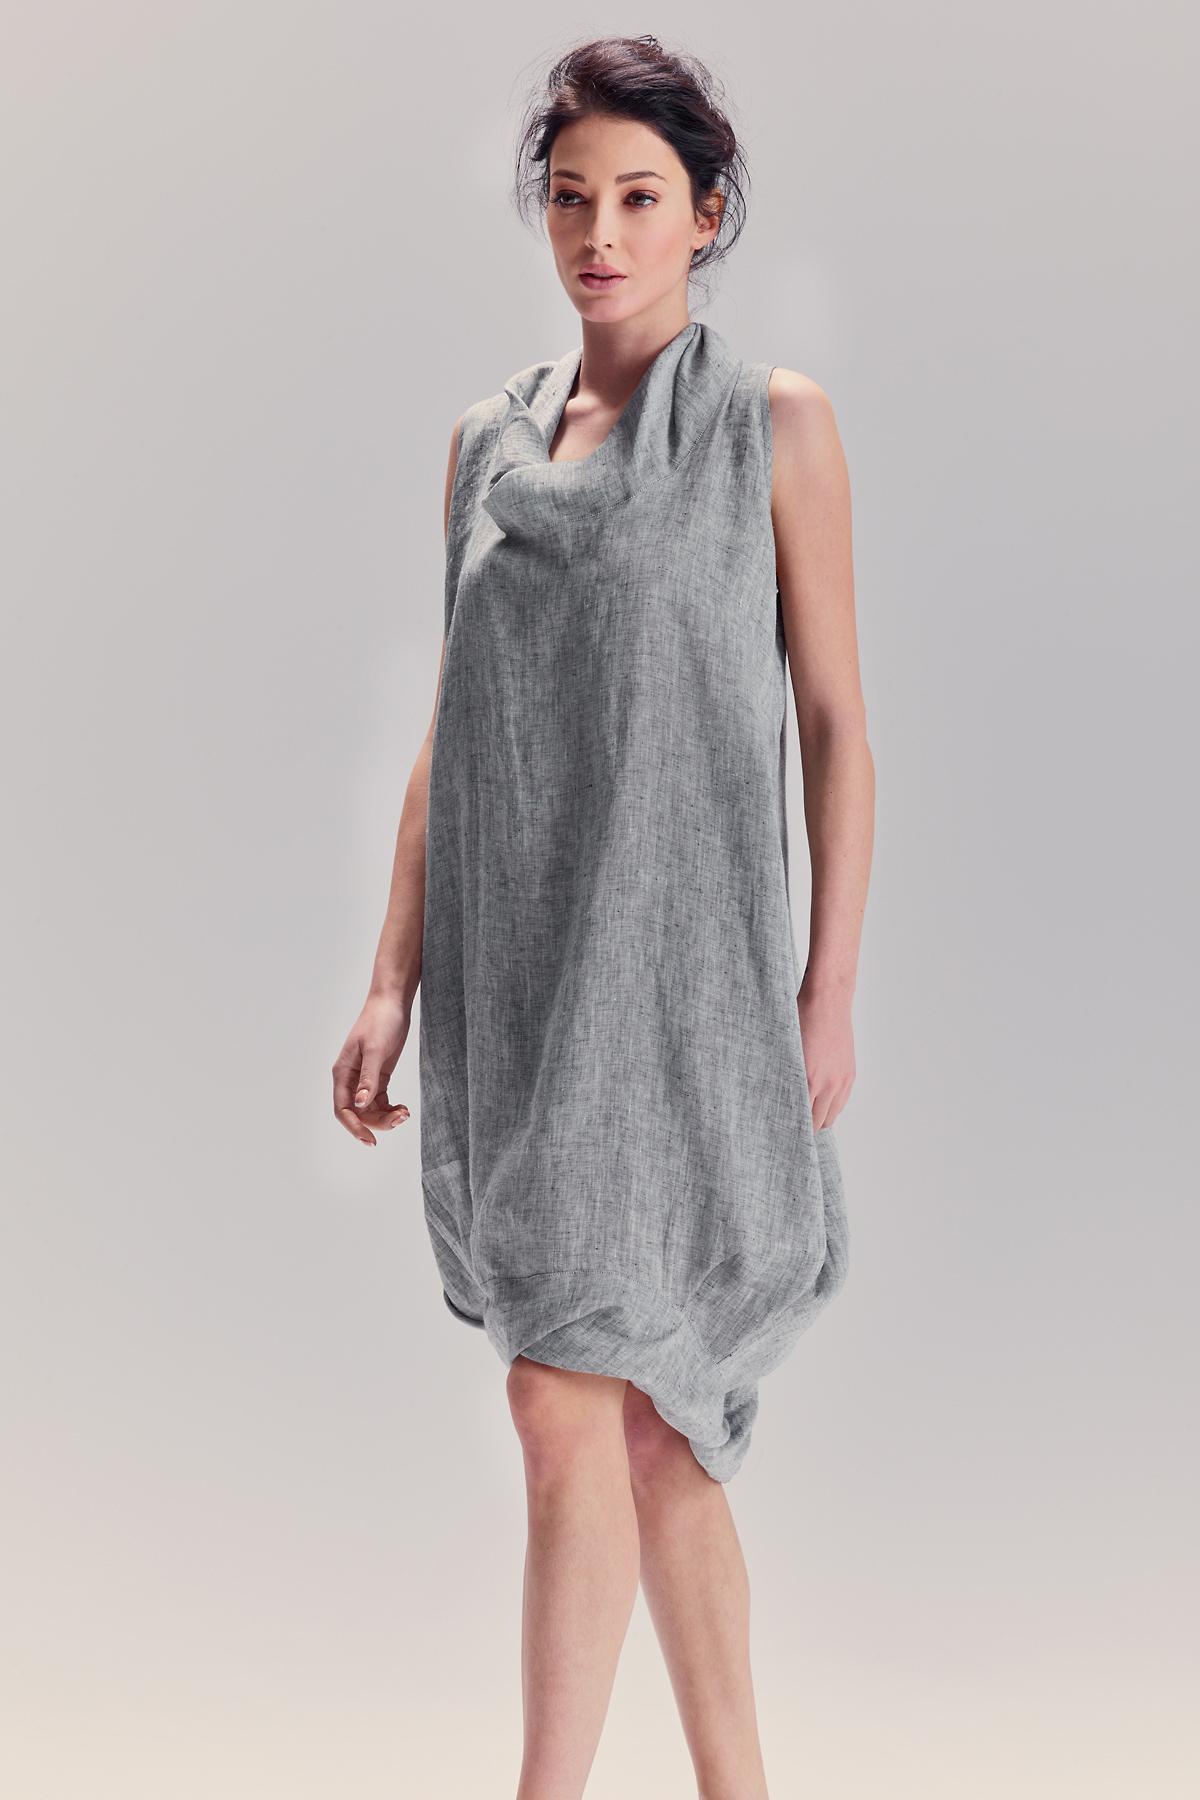 ca691bf7fa4 Light Grey Cocktail Dress - Data Dynamic AG